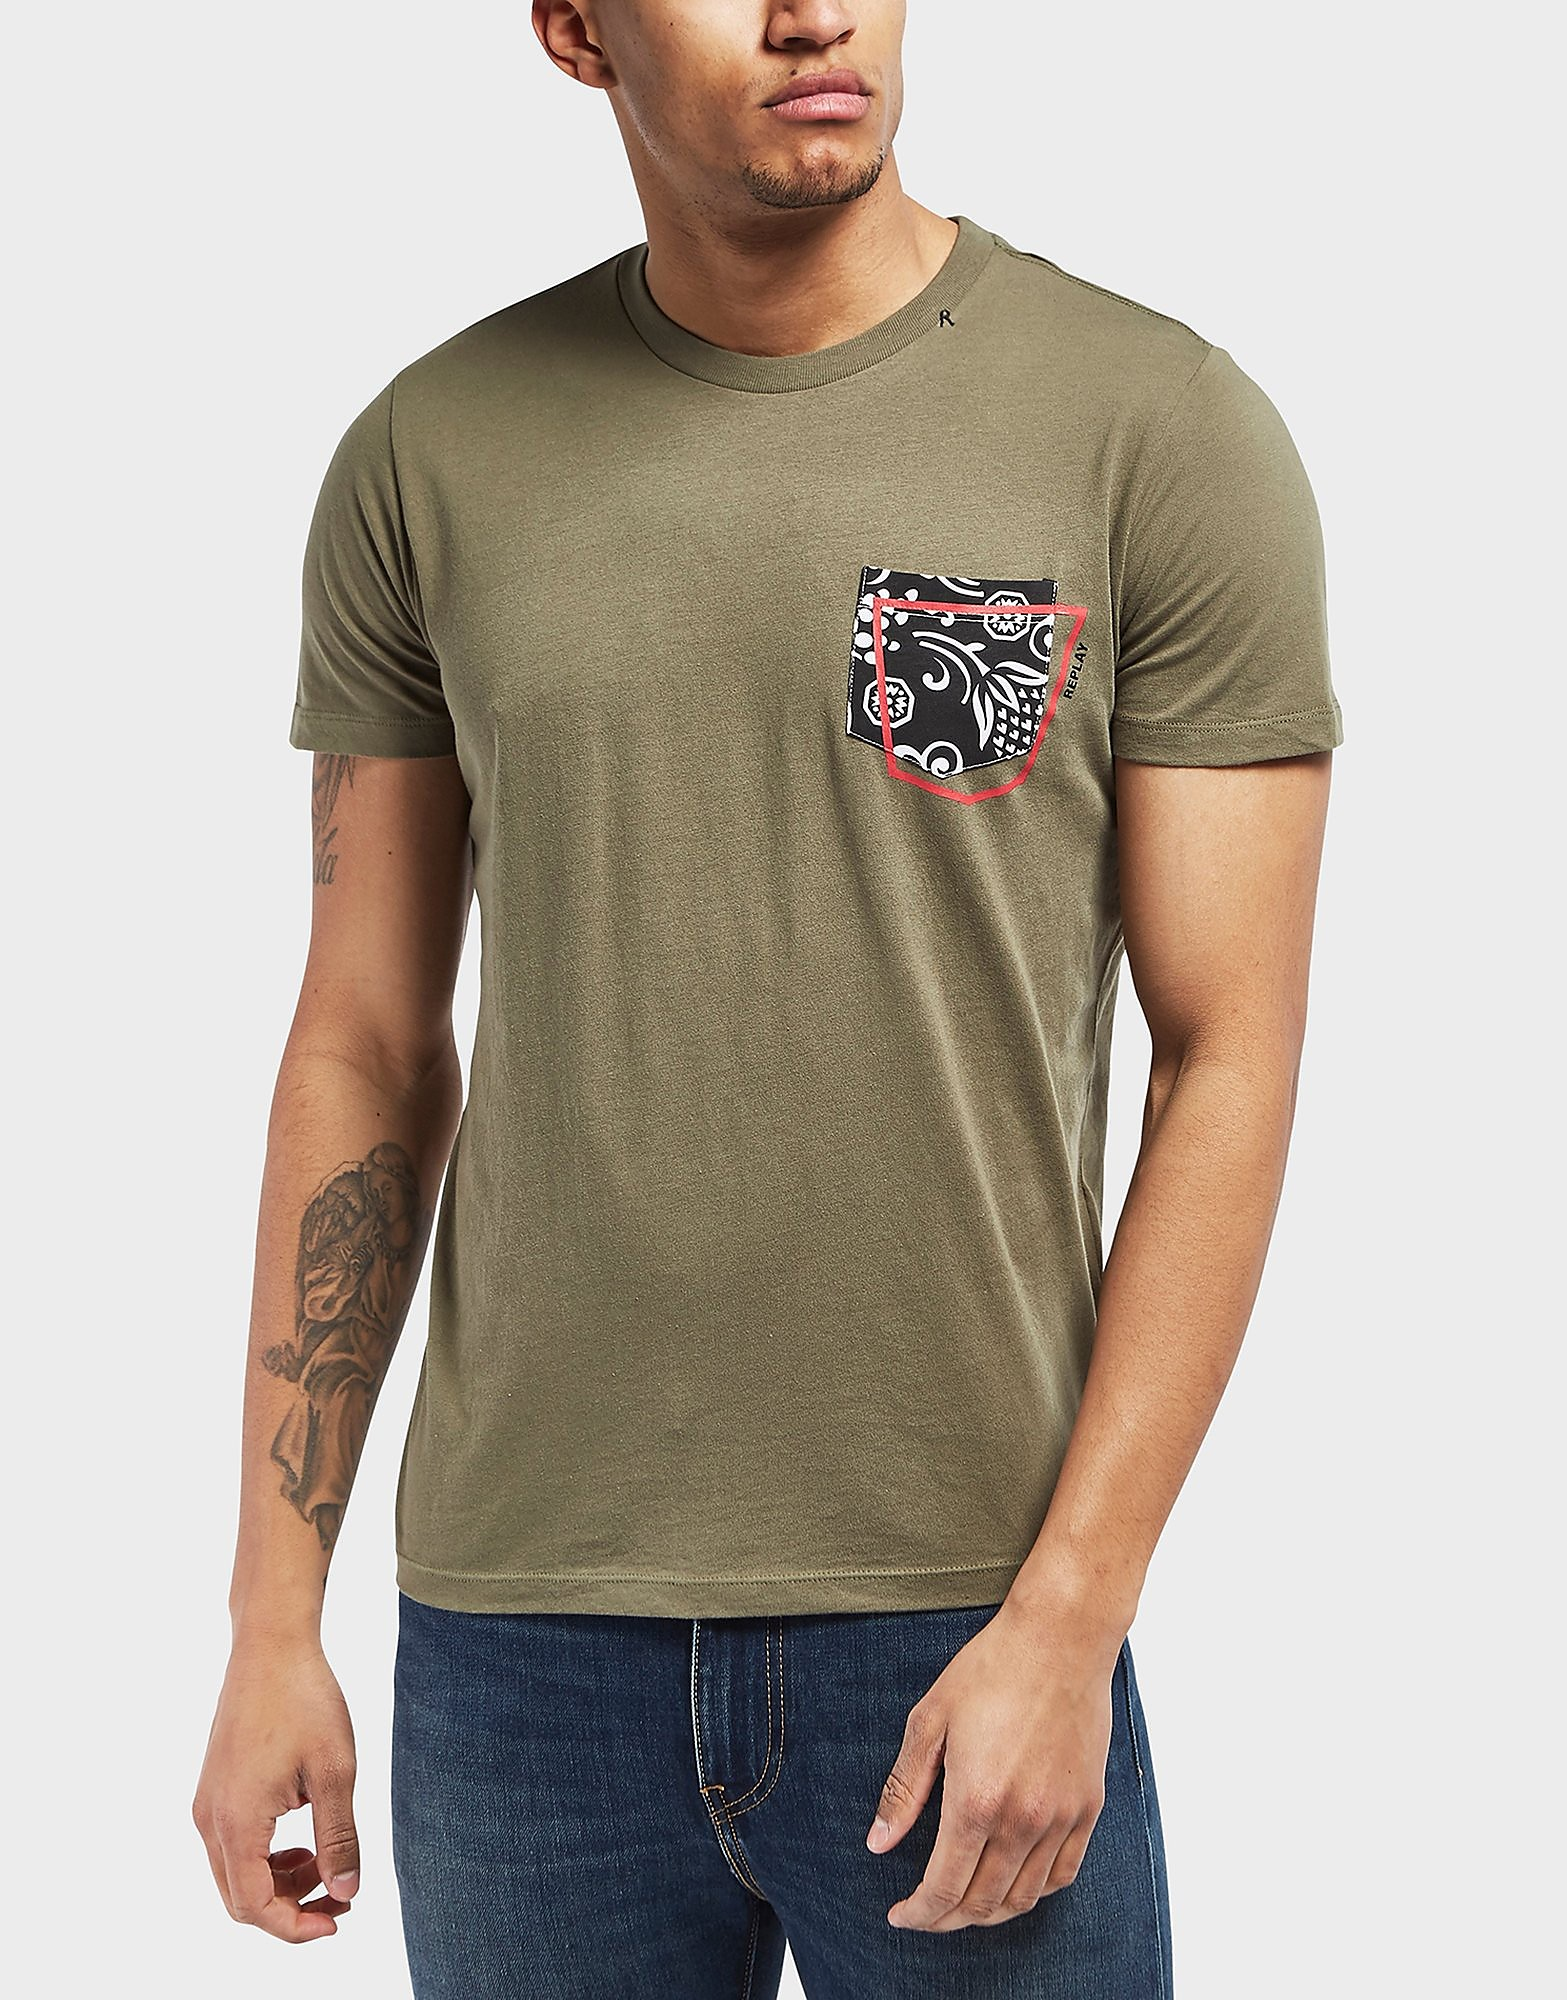 Replay Floral Pocket Short Sleeve T-Shirt